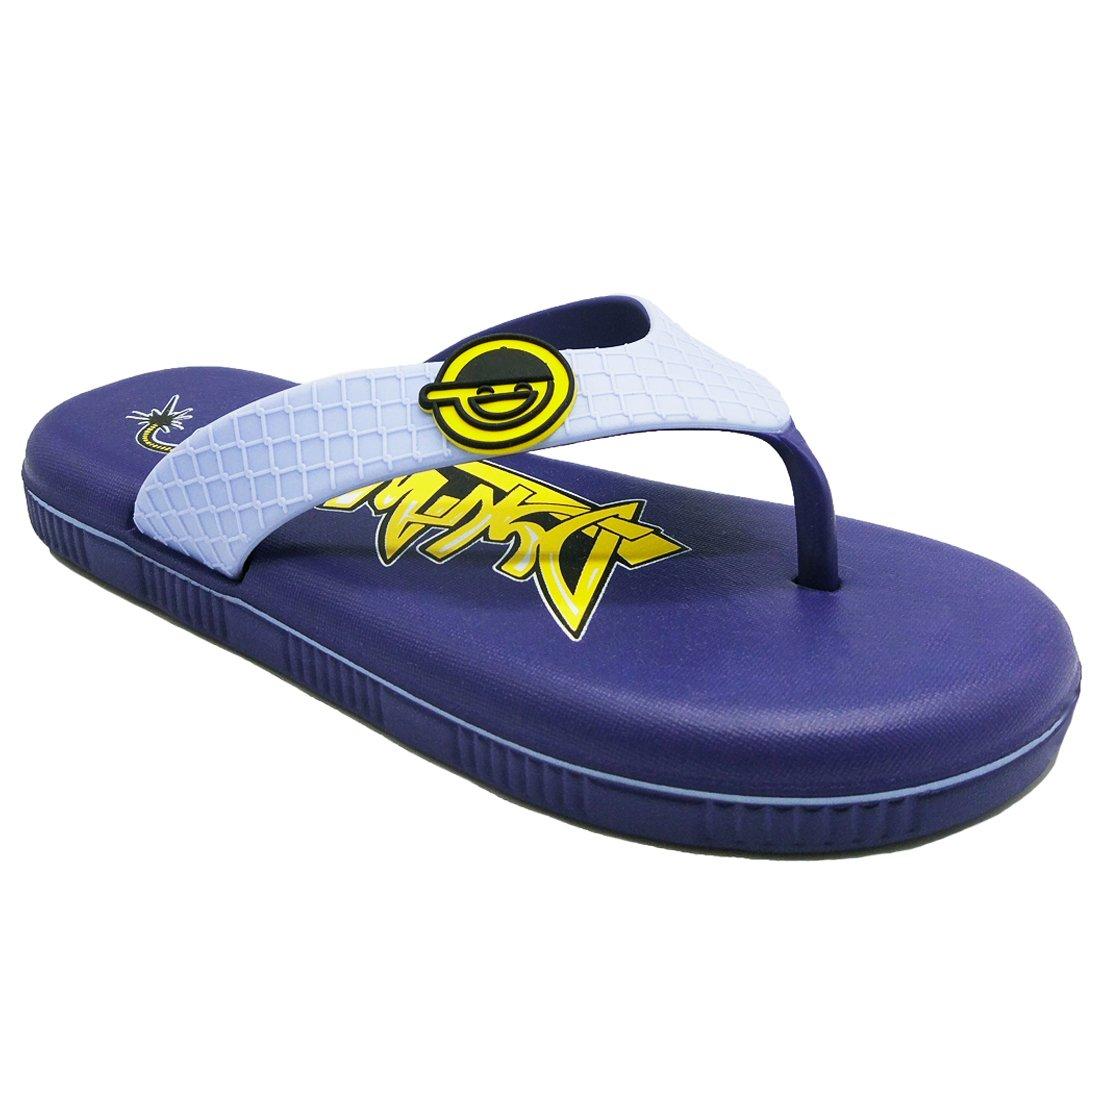 Cuby Boys' Summer Printed Non-Slip Beach Flip Flop Sandals Slipper (6M/38 US Big Kid, Blue)